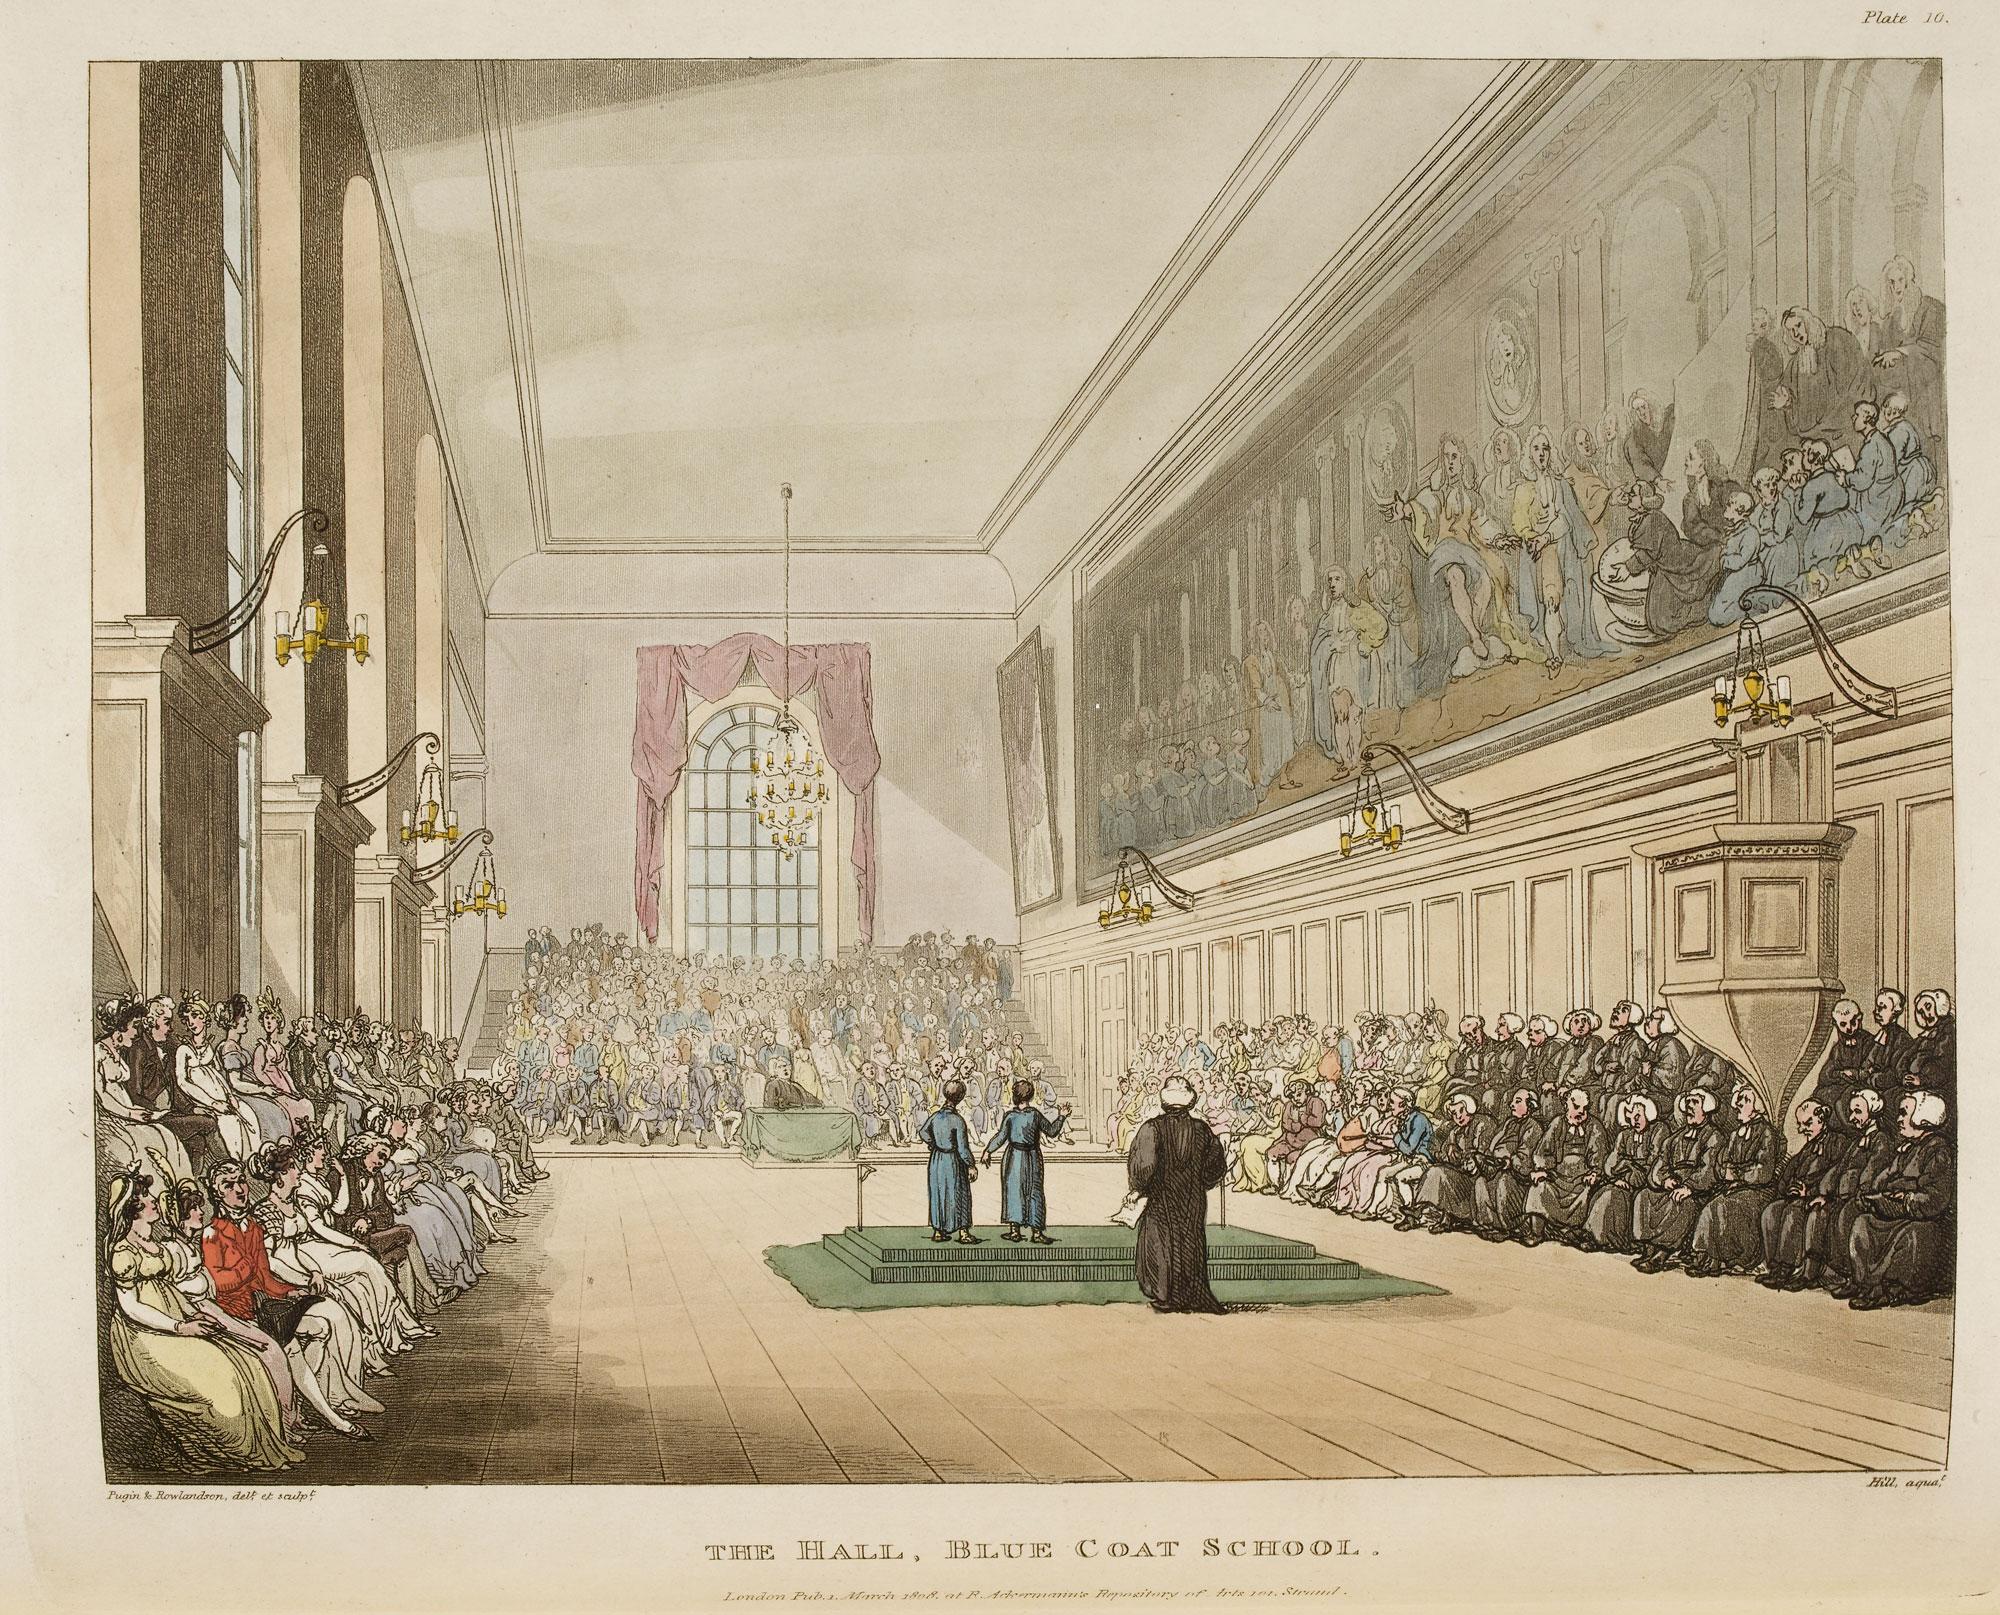 Illustration of The Hall, Blue Coat School